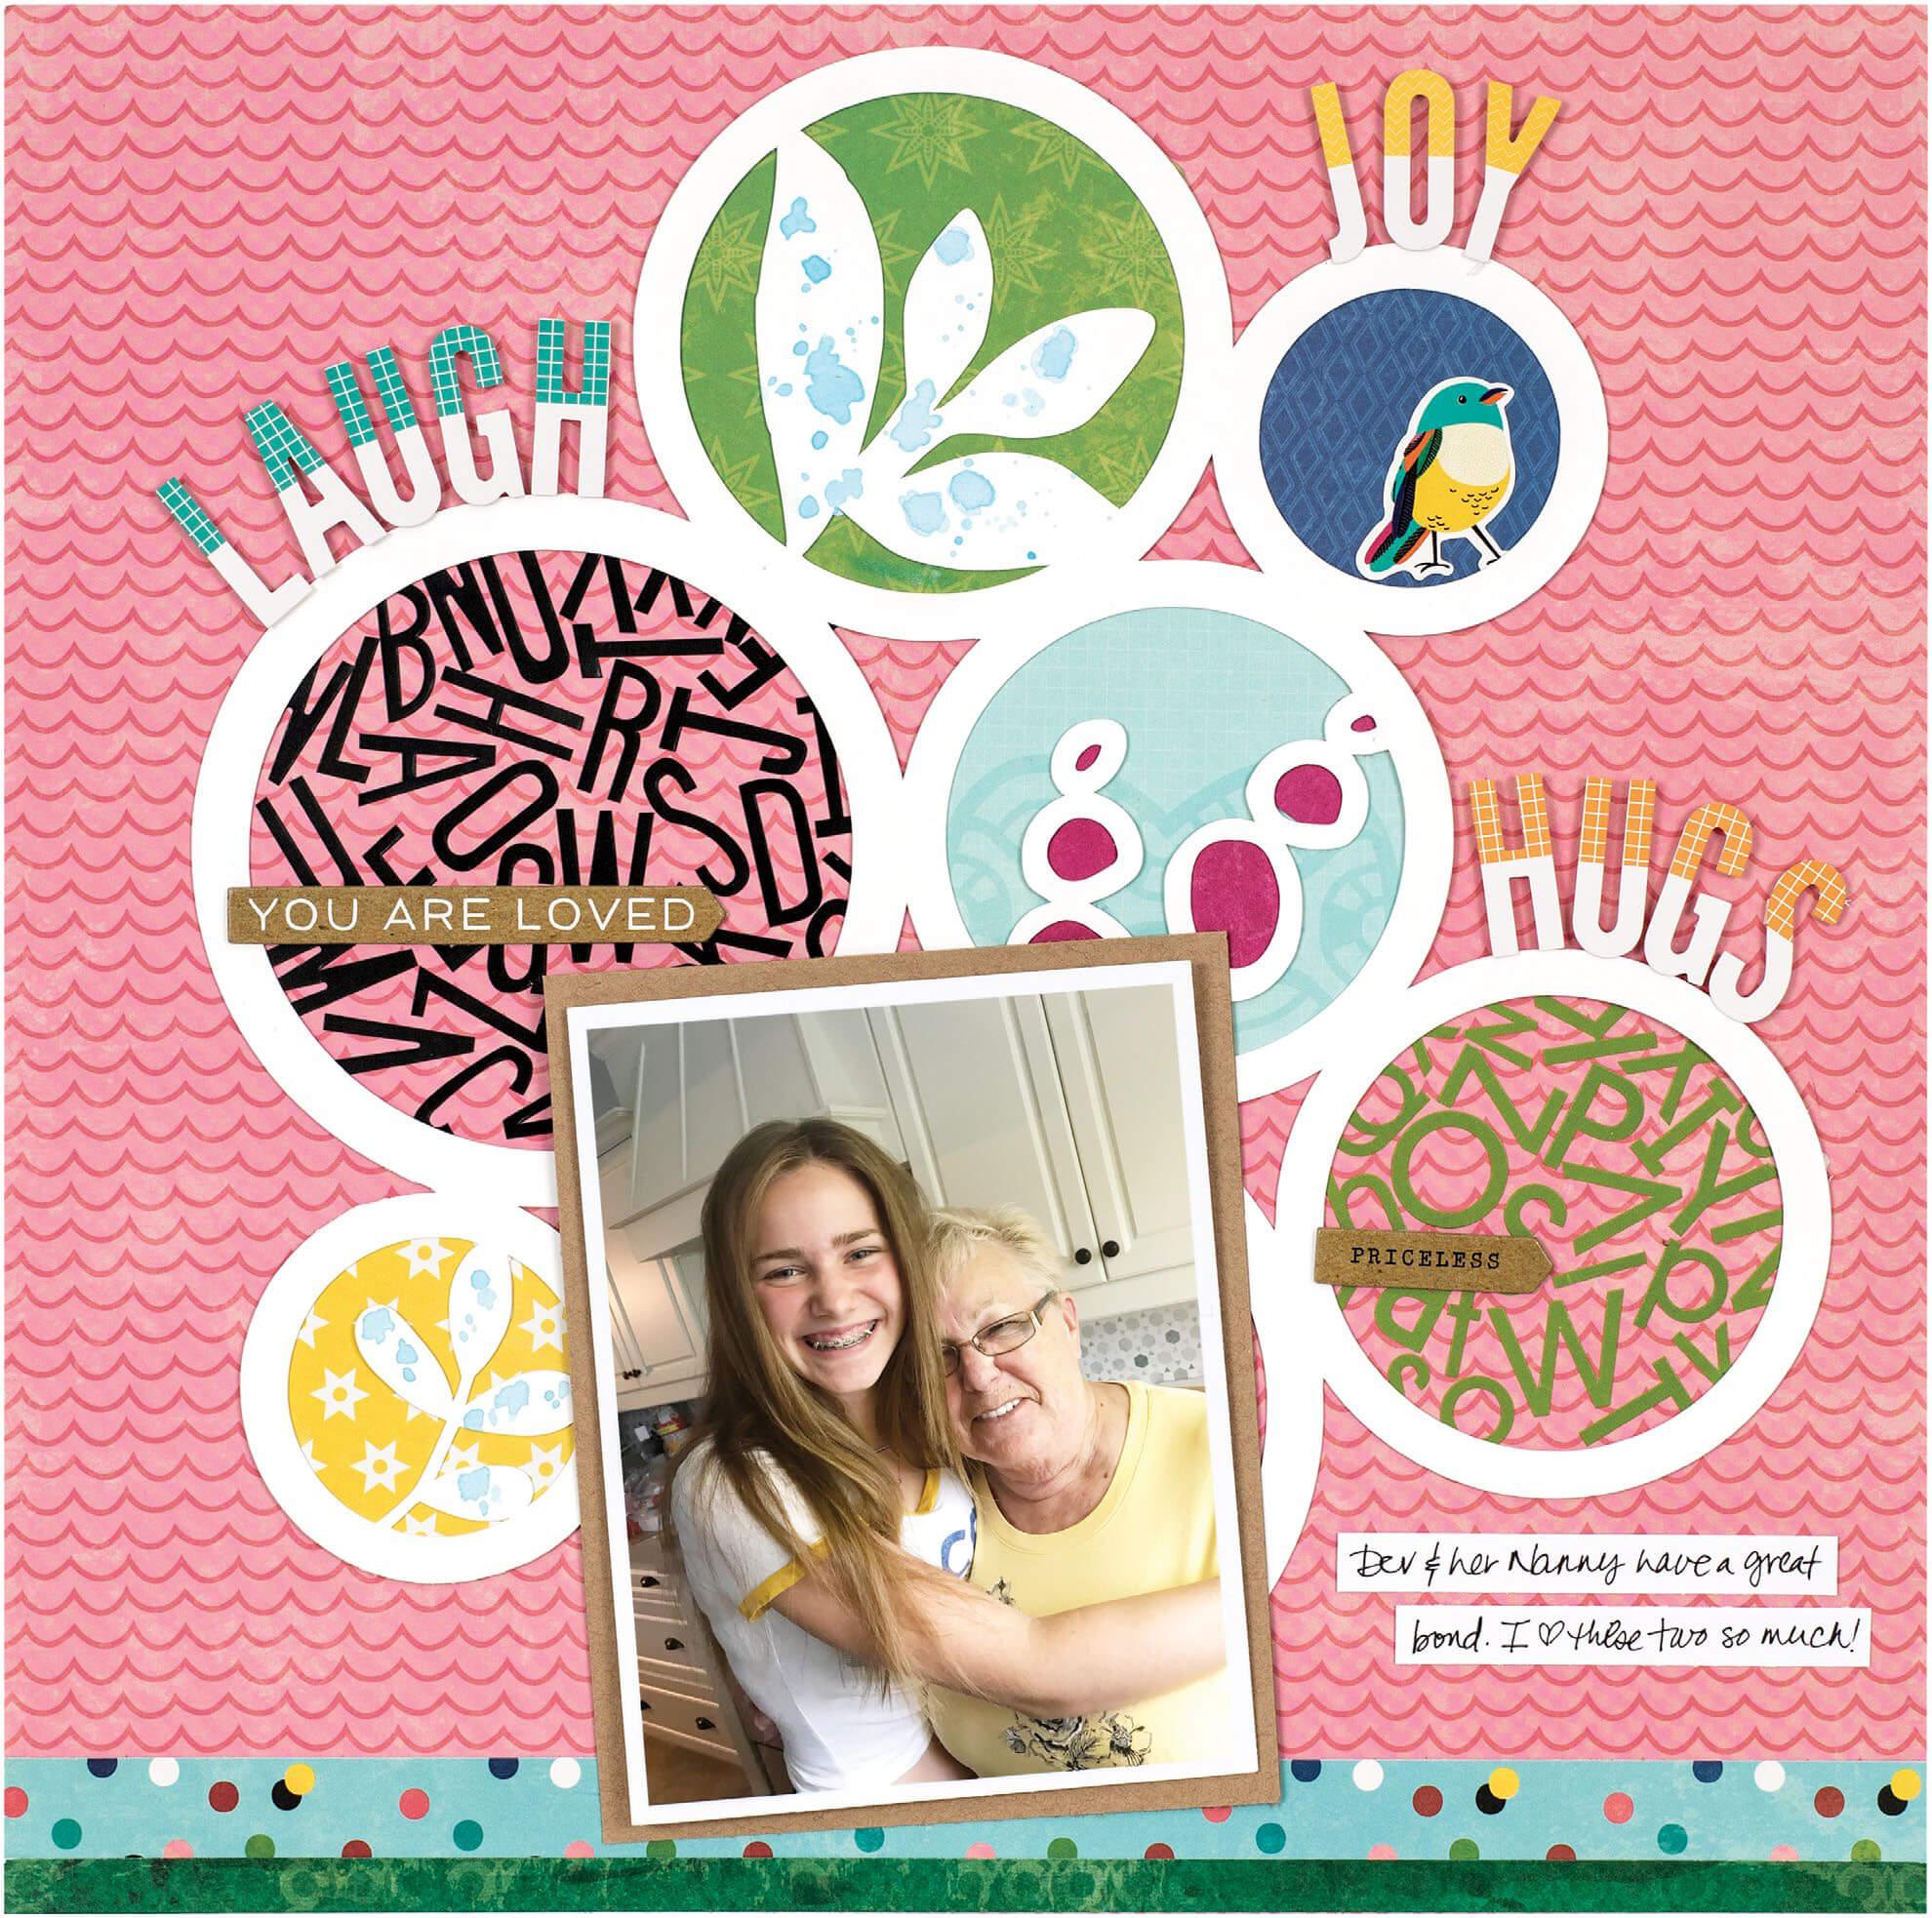 Scrapbook & Cards Today - Summer 2019 - Laugh Joy Hugs layout by Vicki Boutin